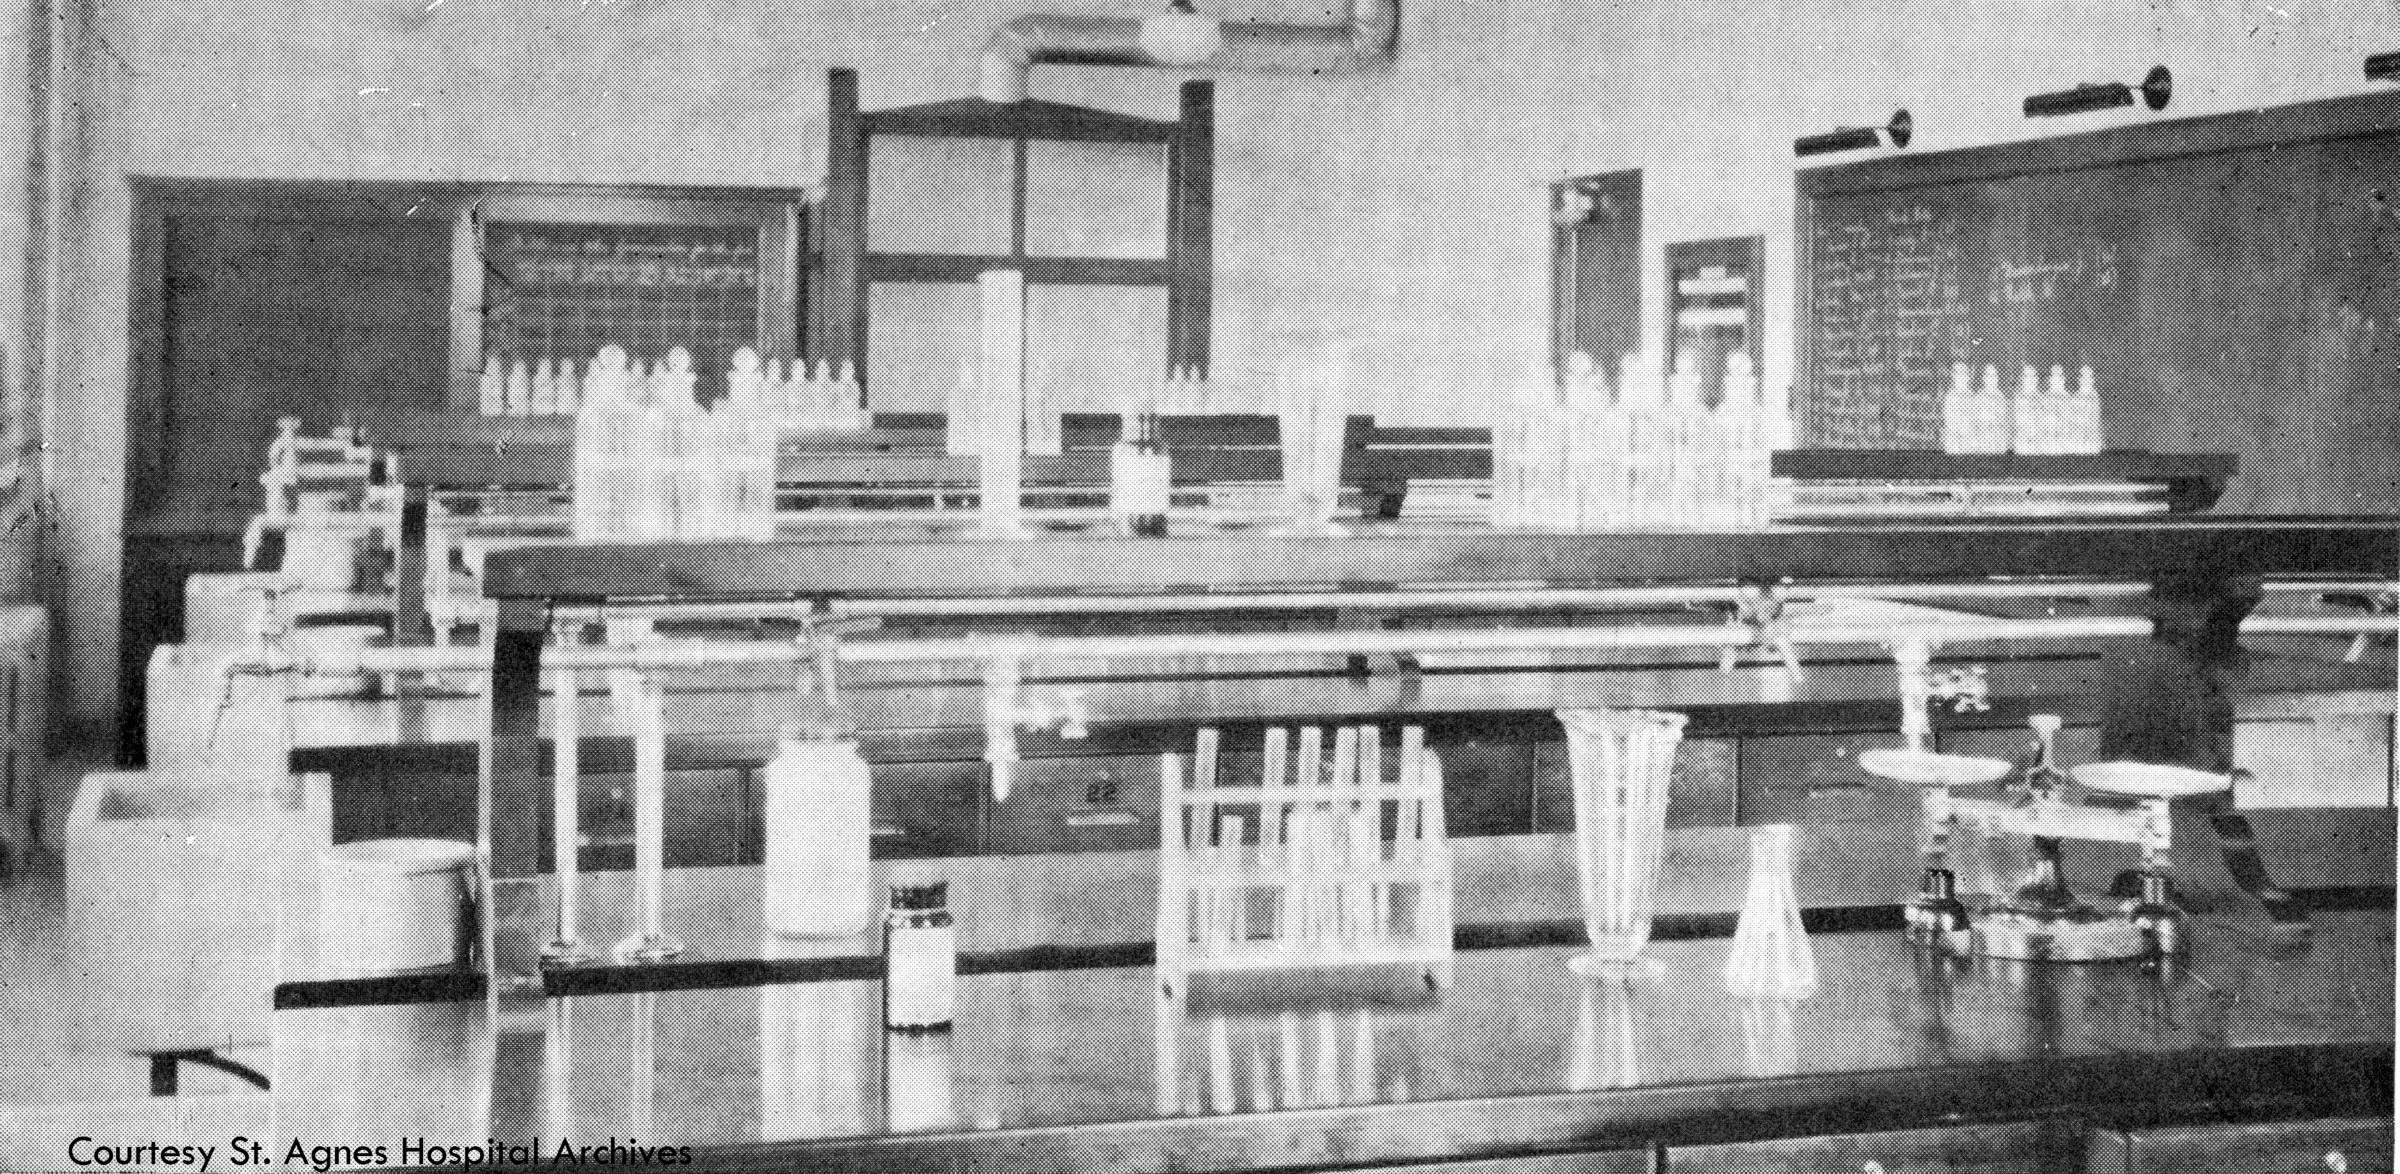 Laboratory classroom at St. Agnes School of Nursing, c. 1931.